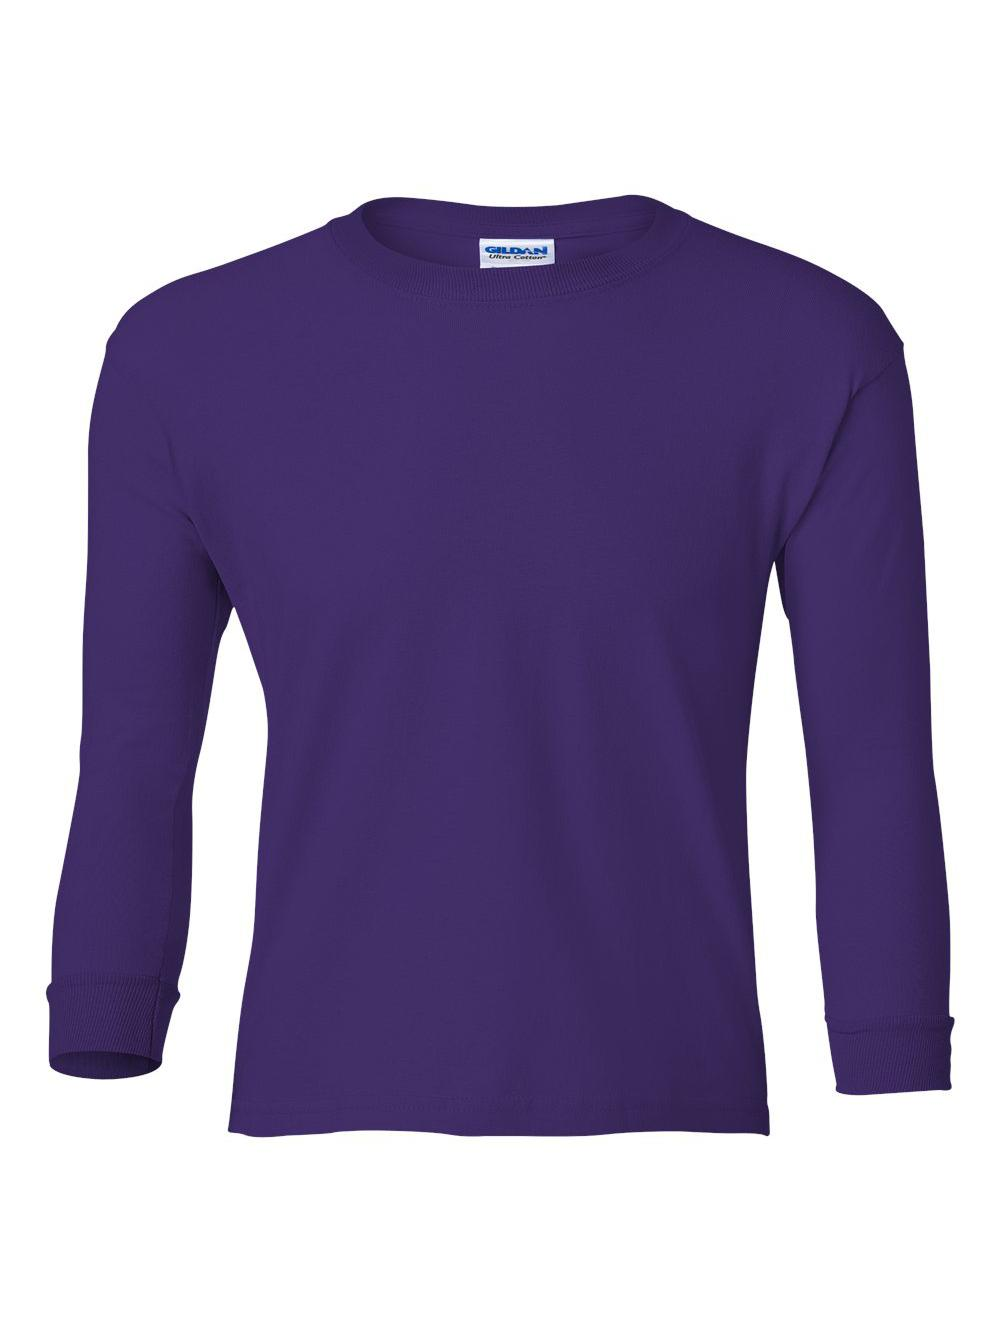 Gildan-Ultra-Cotton-Youth-Long-Sleeve-T-Shirt-2400B thumbnail 30